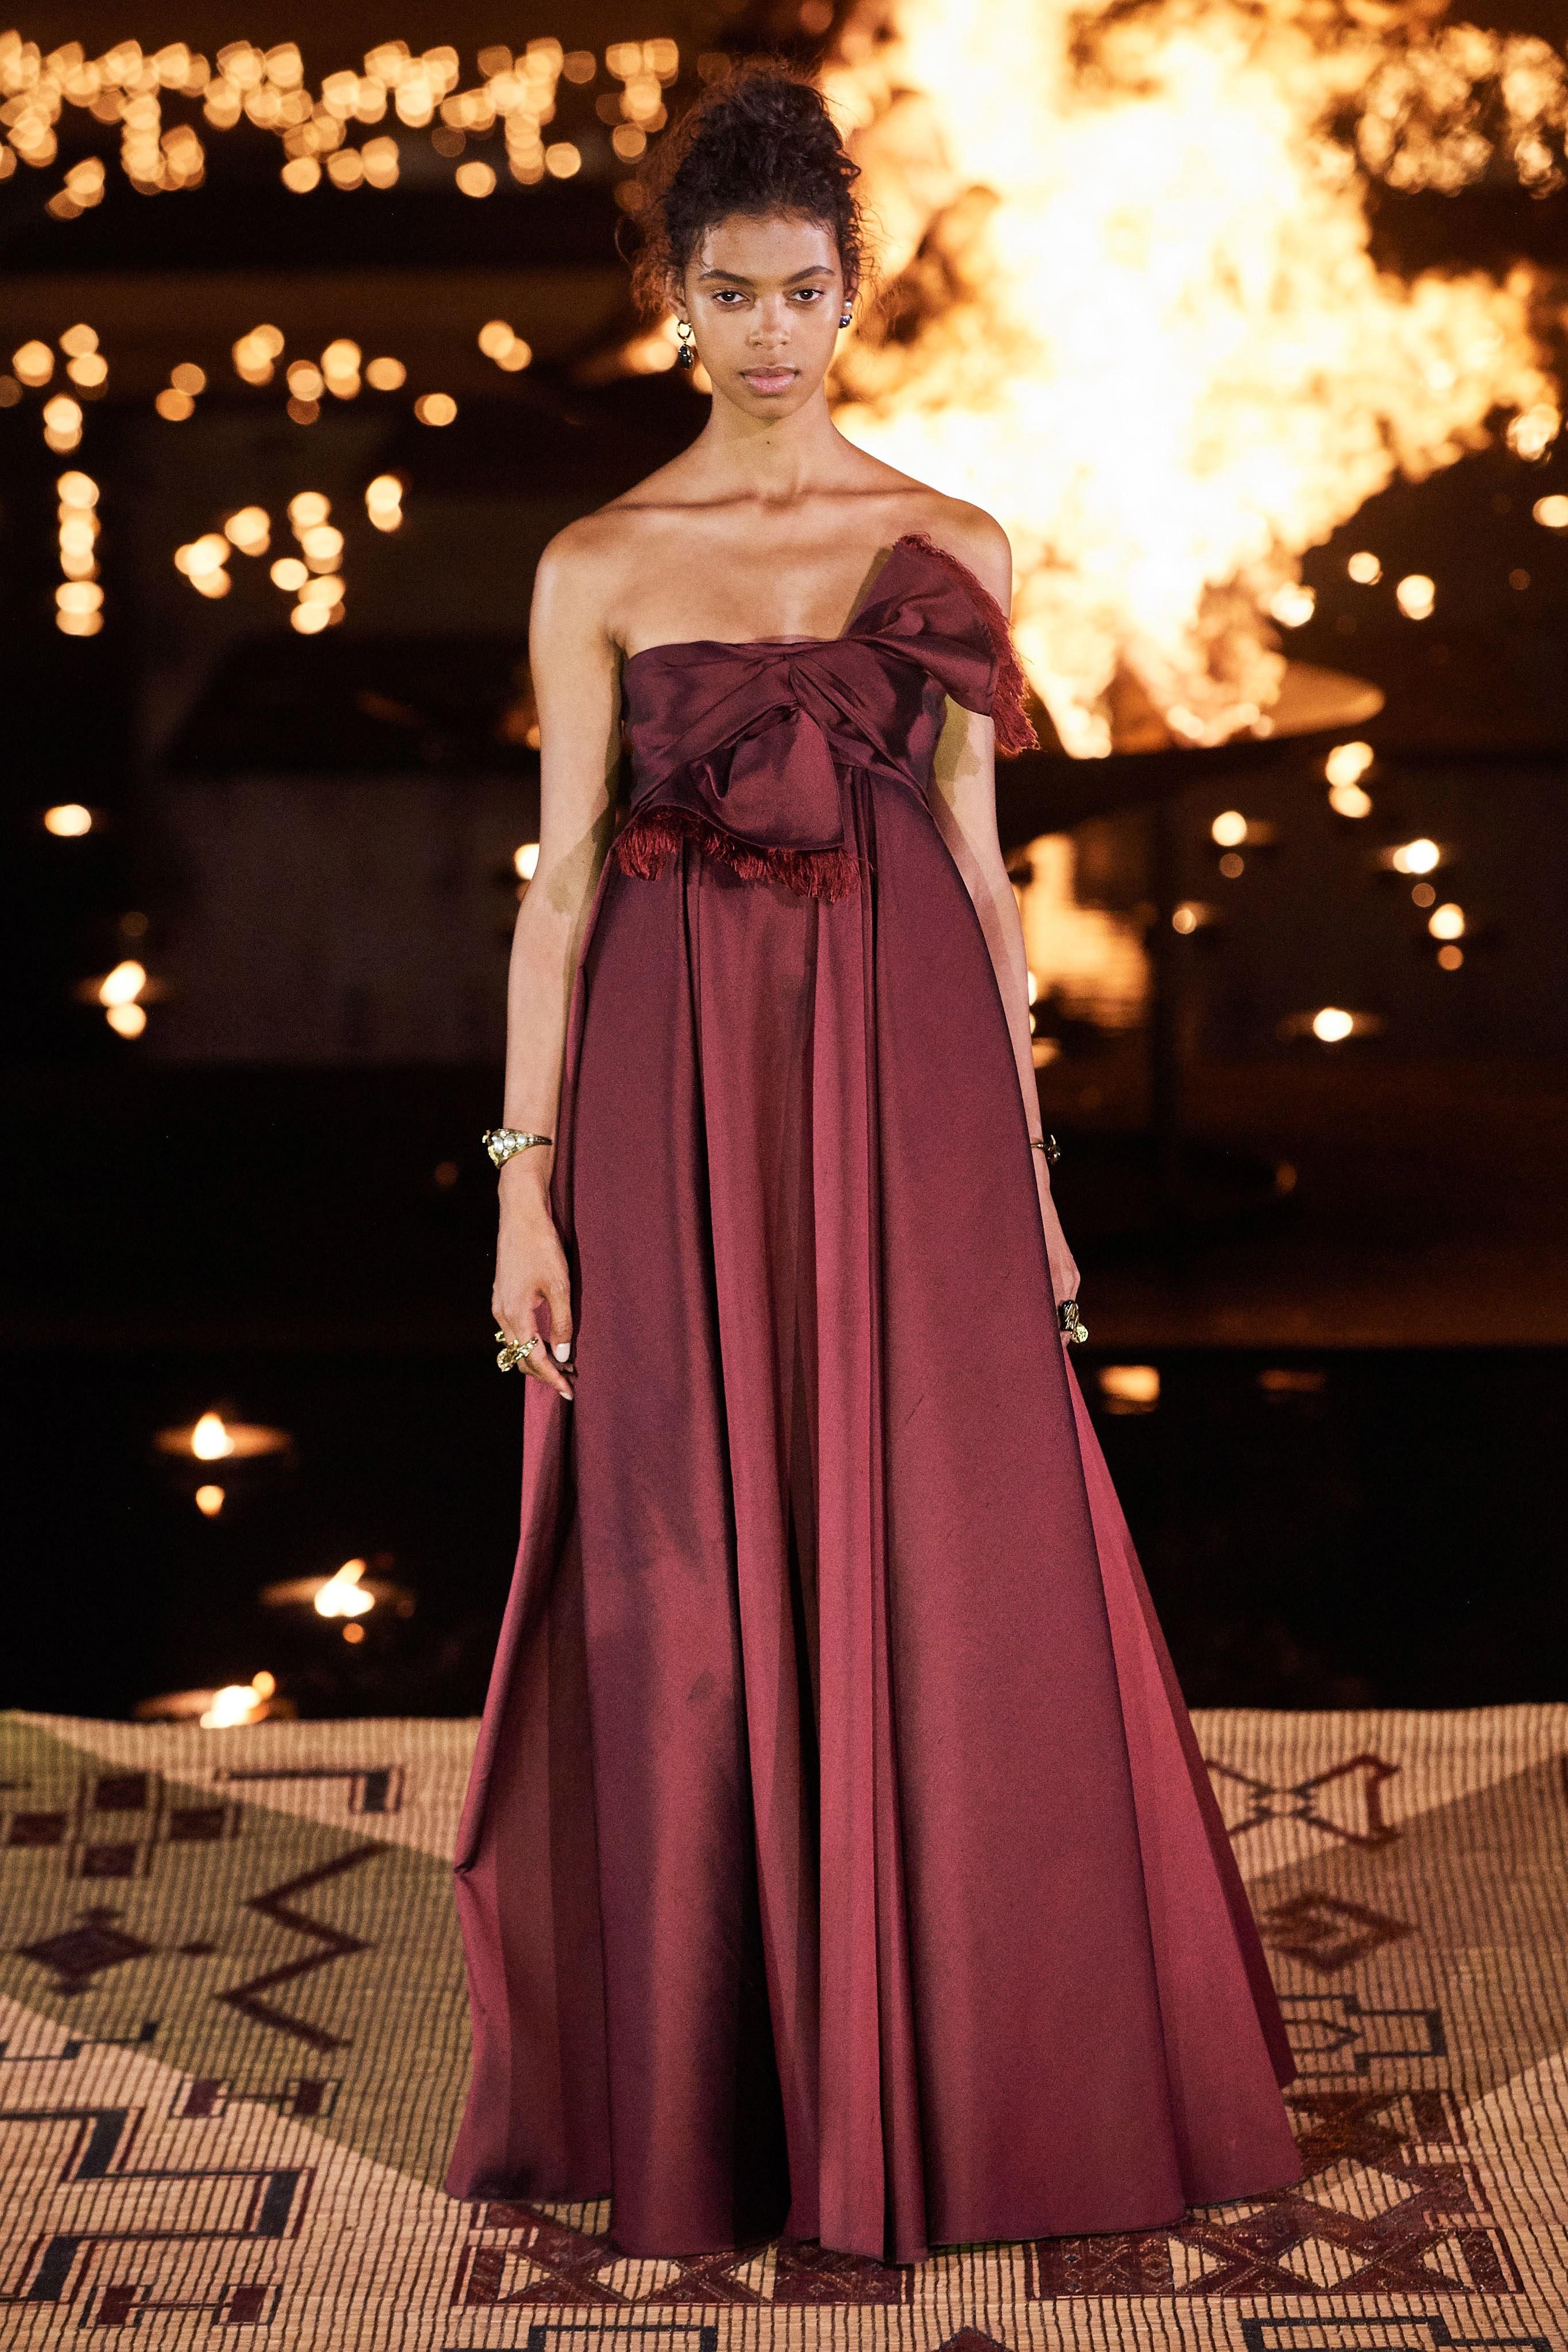 Dior 2020 cruise collection